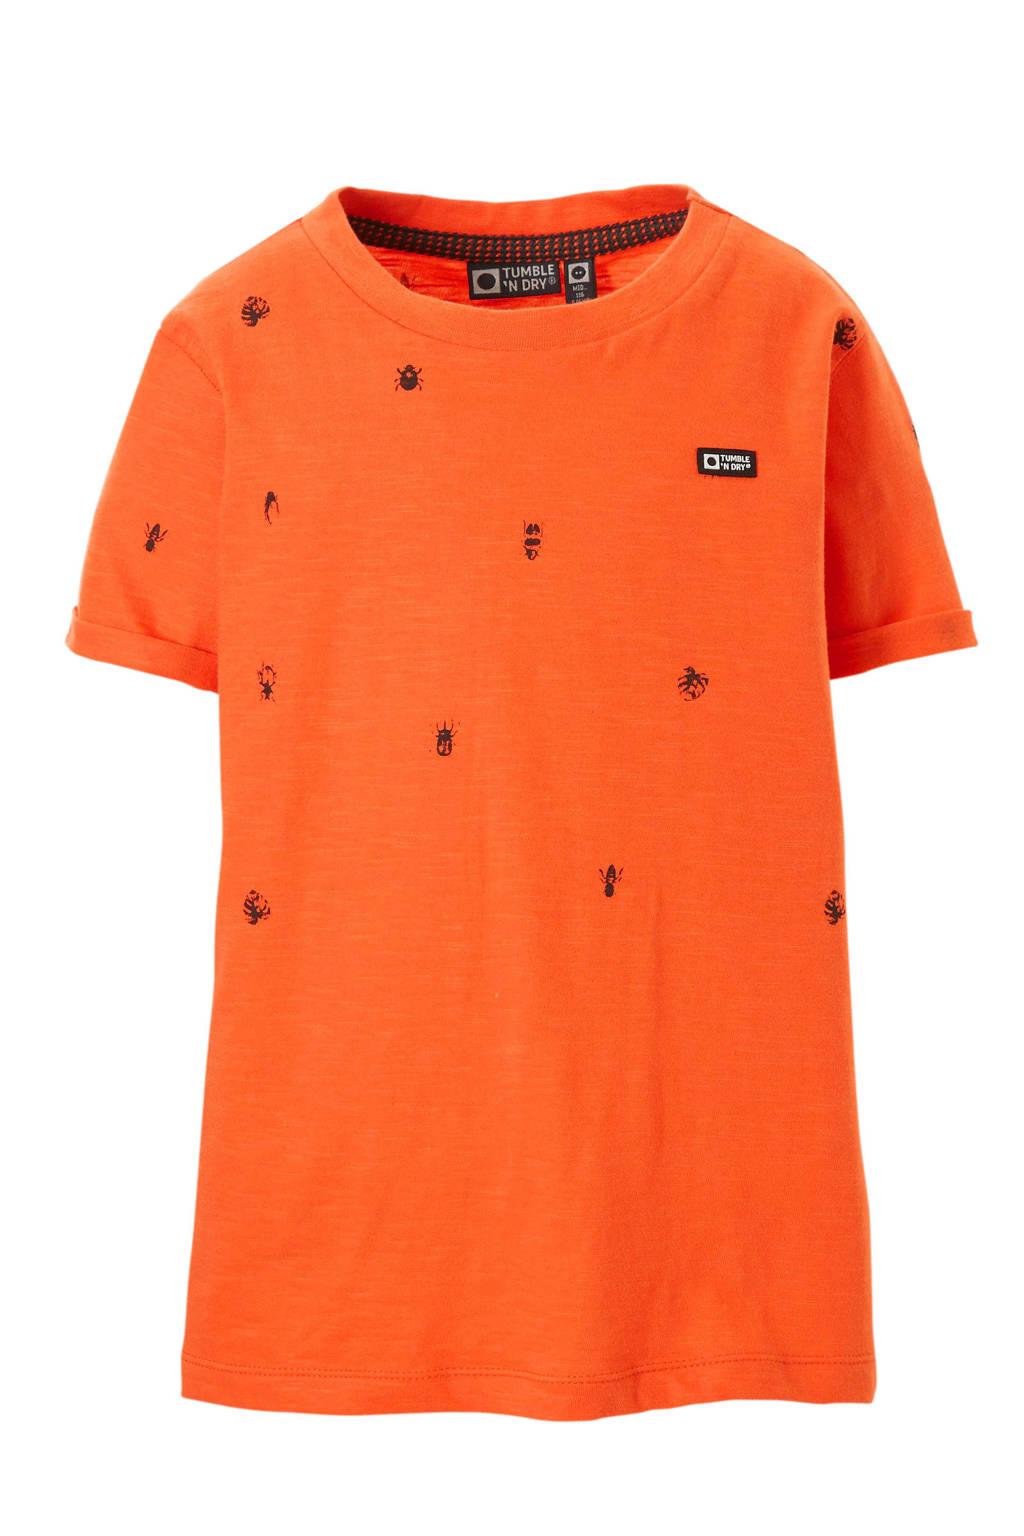 Tumble 'n Dry Mid T-shirt met dierenprint oranje, Oranje